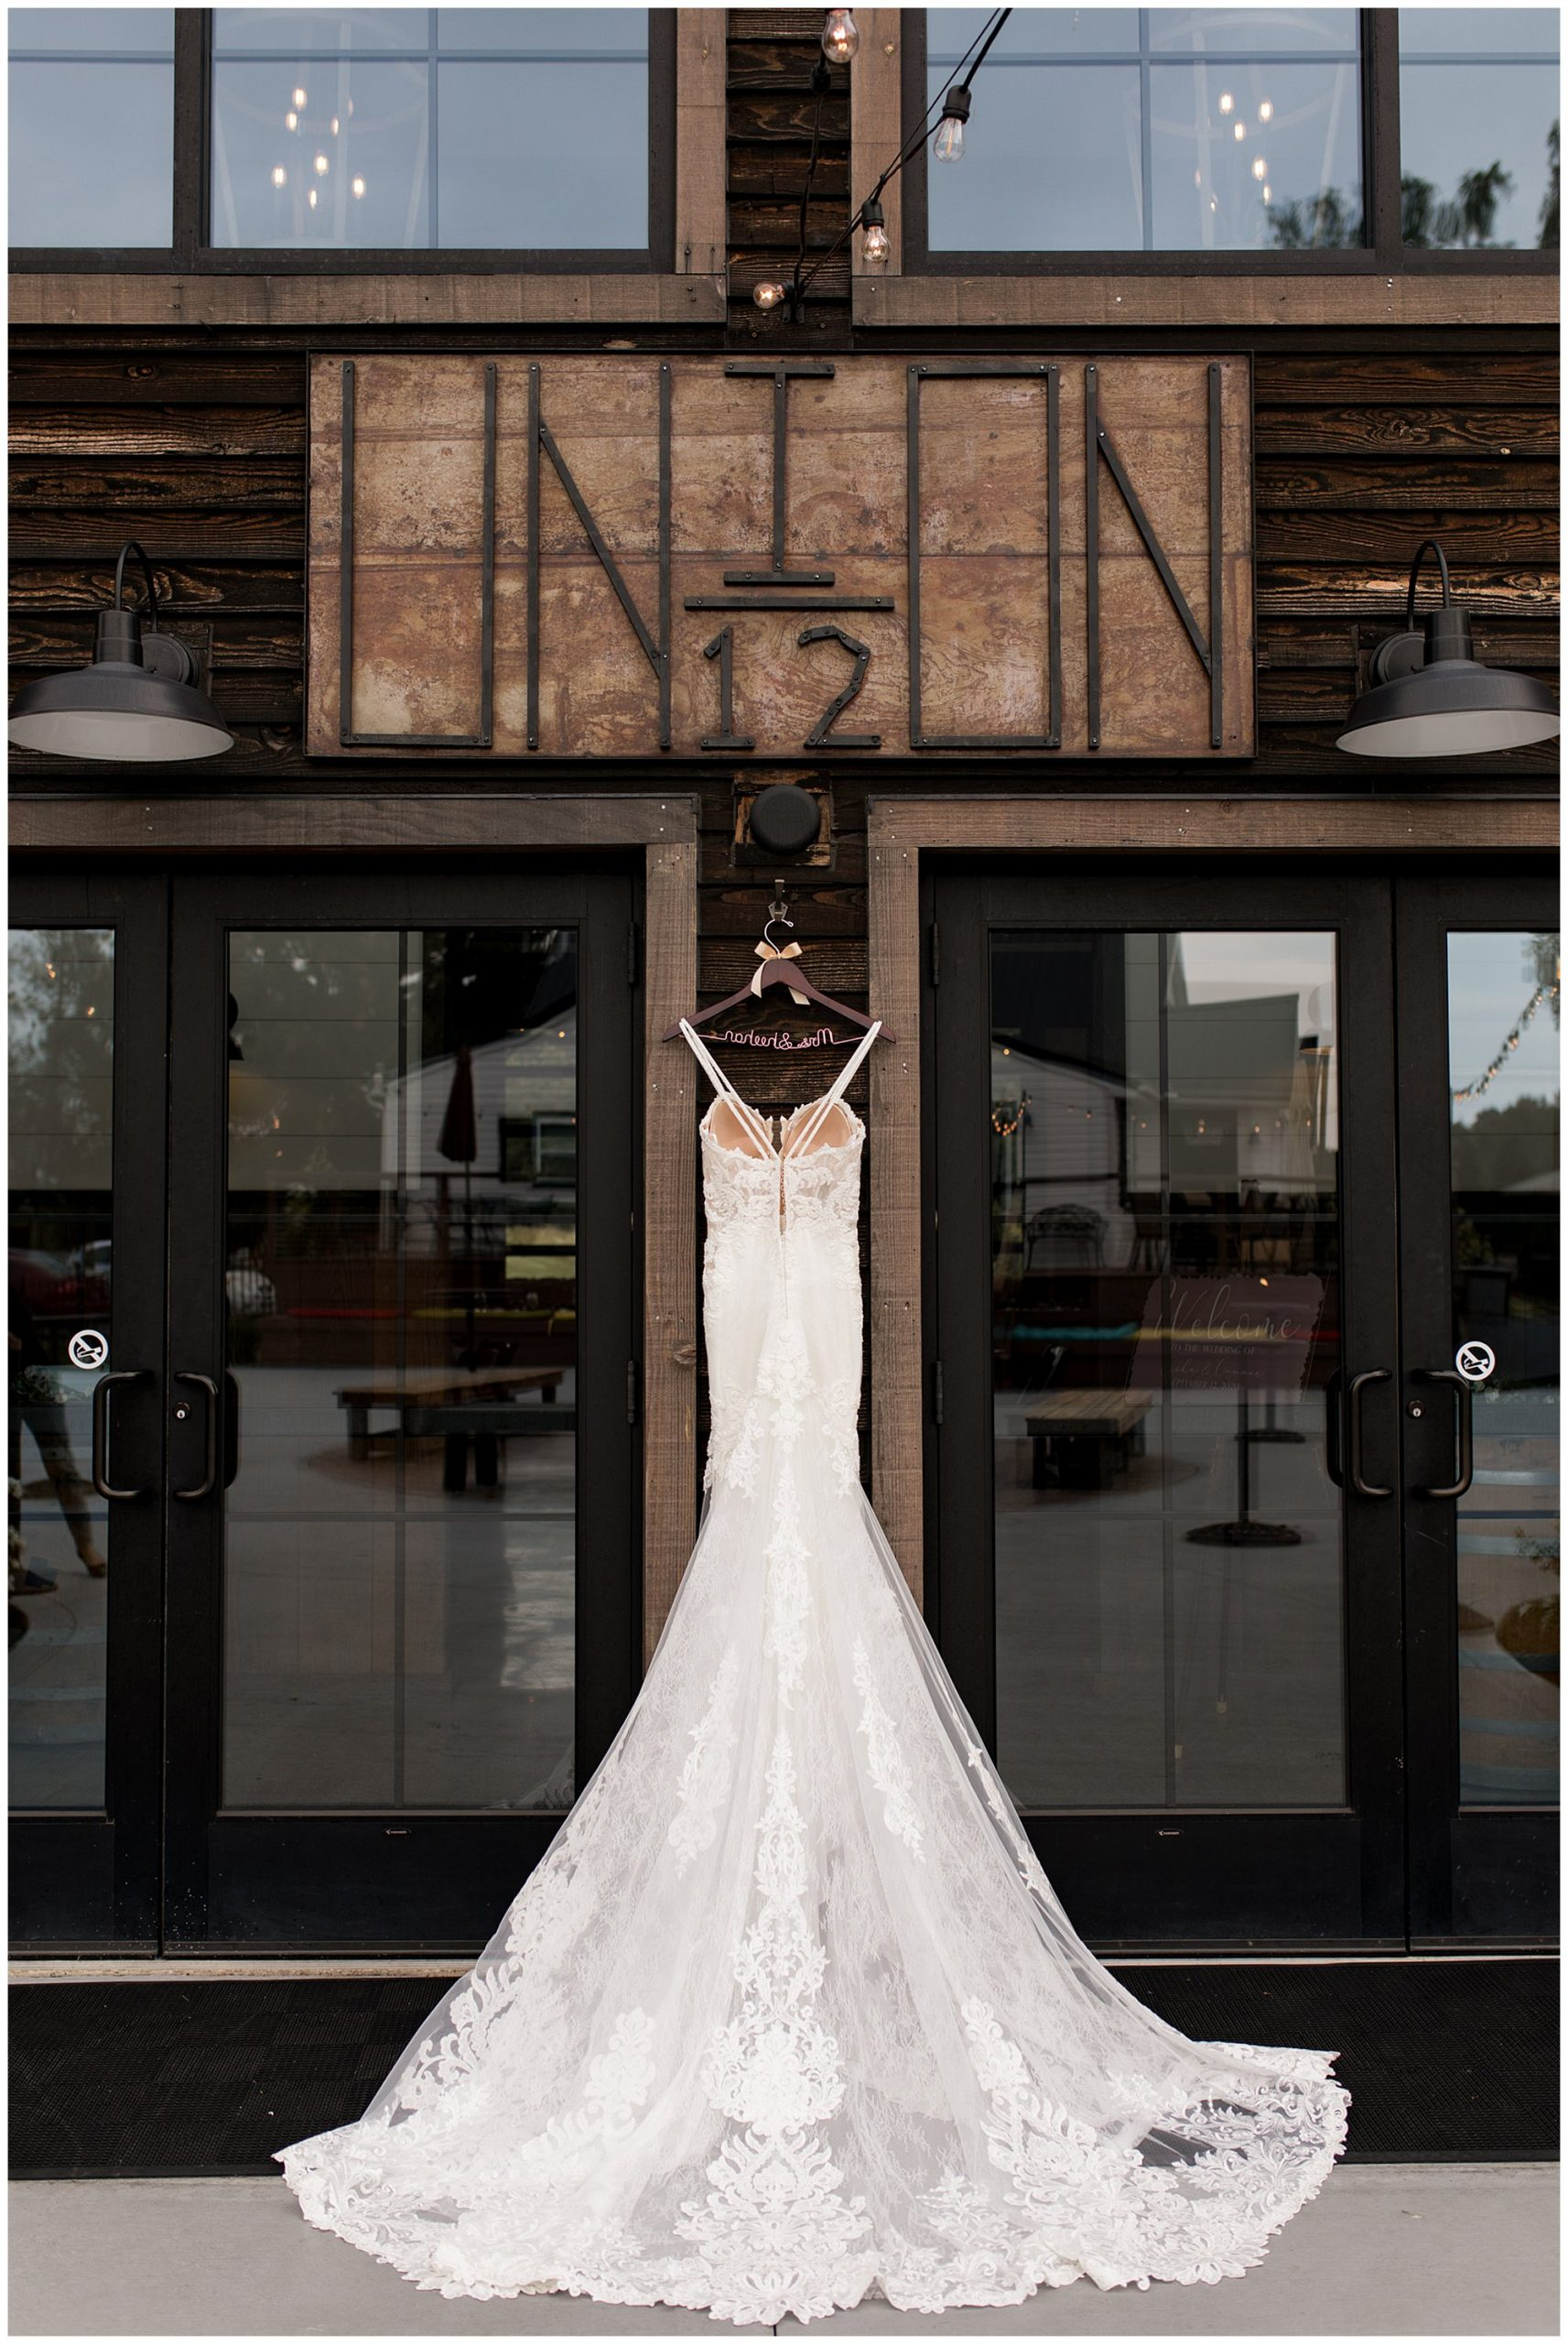 bride's wedding dress under sign at Union 12